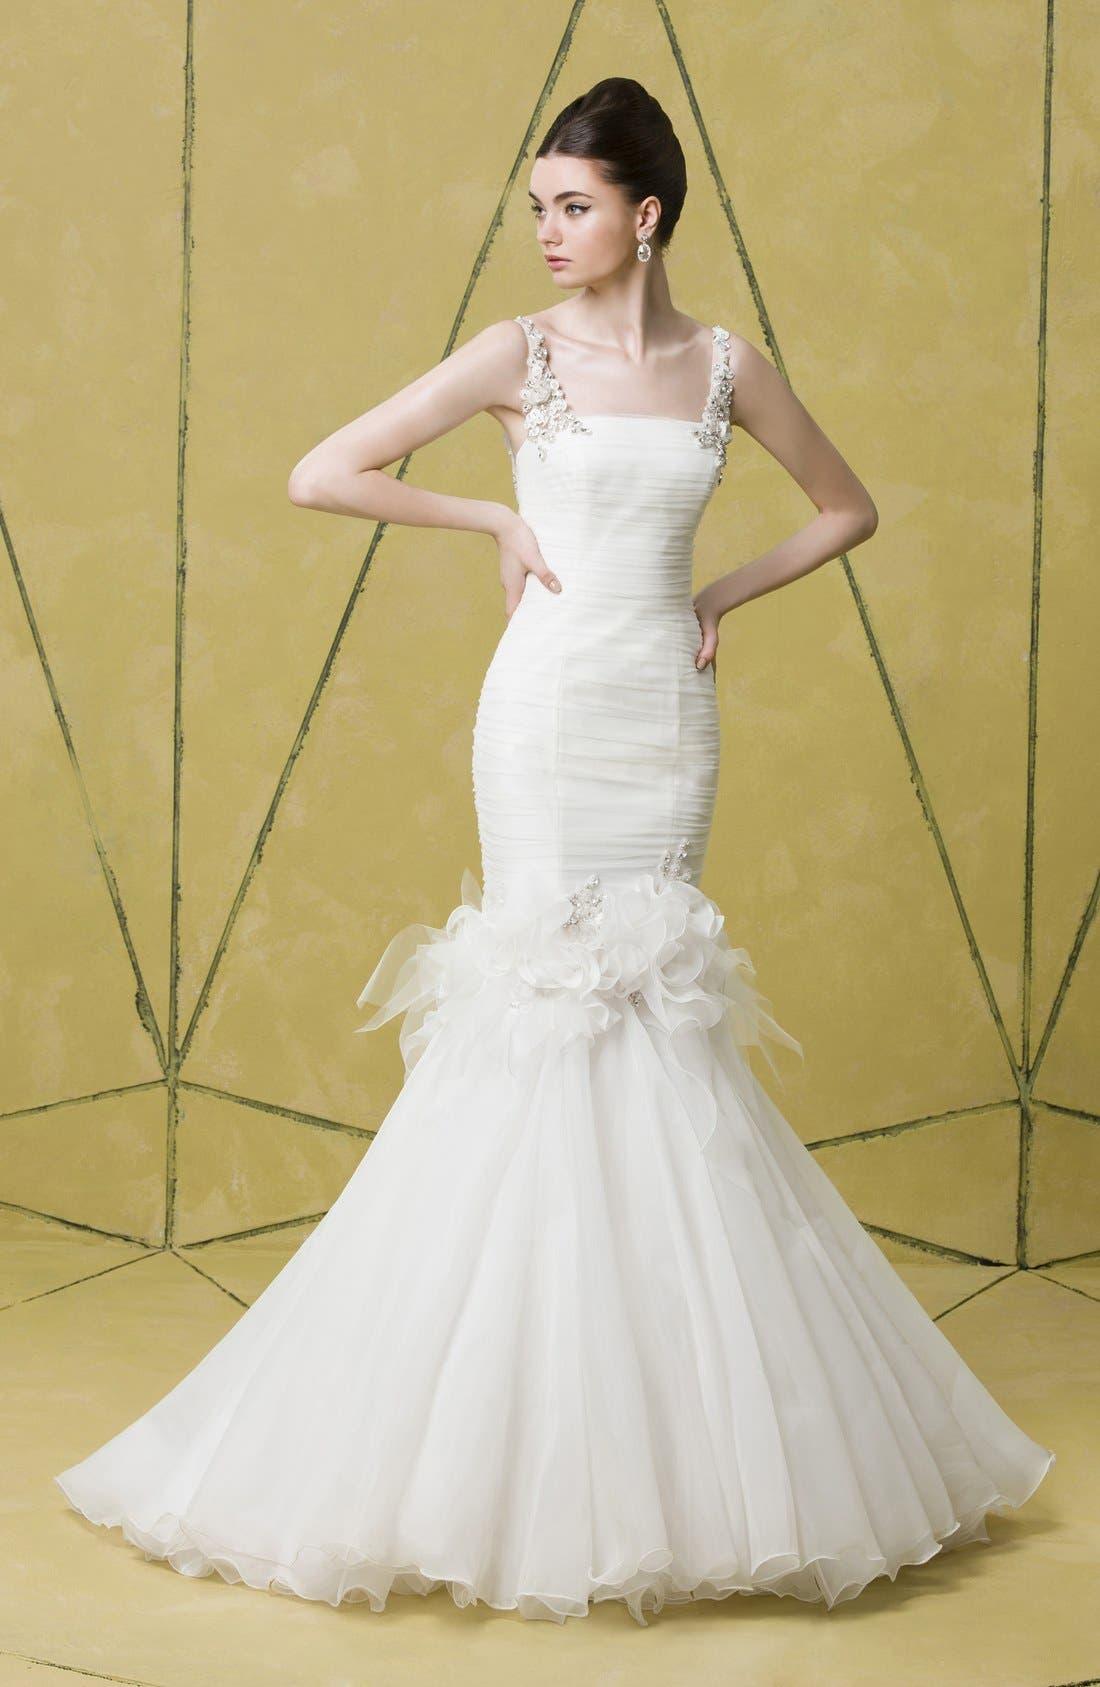 Alternate Image 4  - Badgley Mischka Bridal 'Grace' Embellished Tulle & Chiffon Mermaid Dress (In Stores Only)